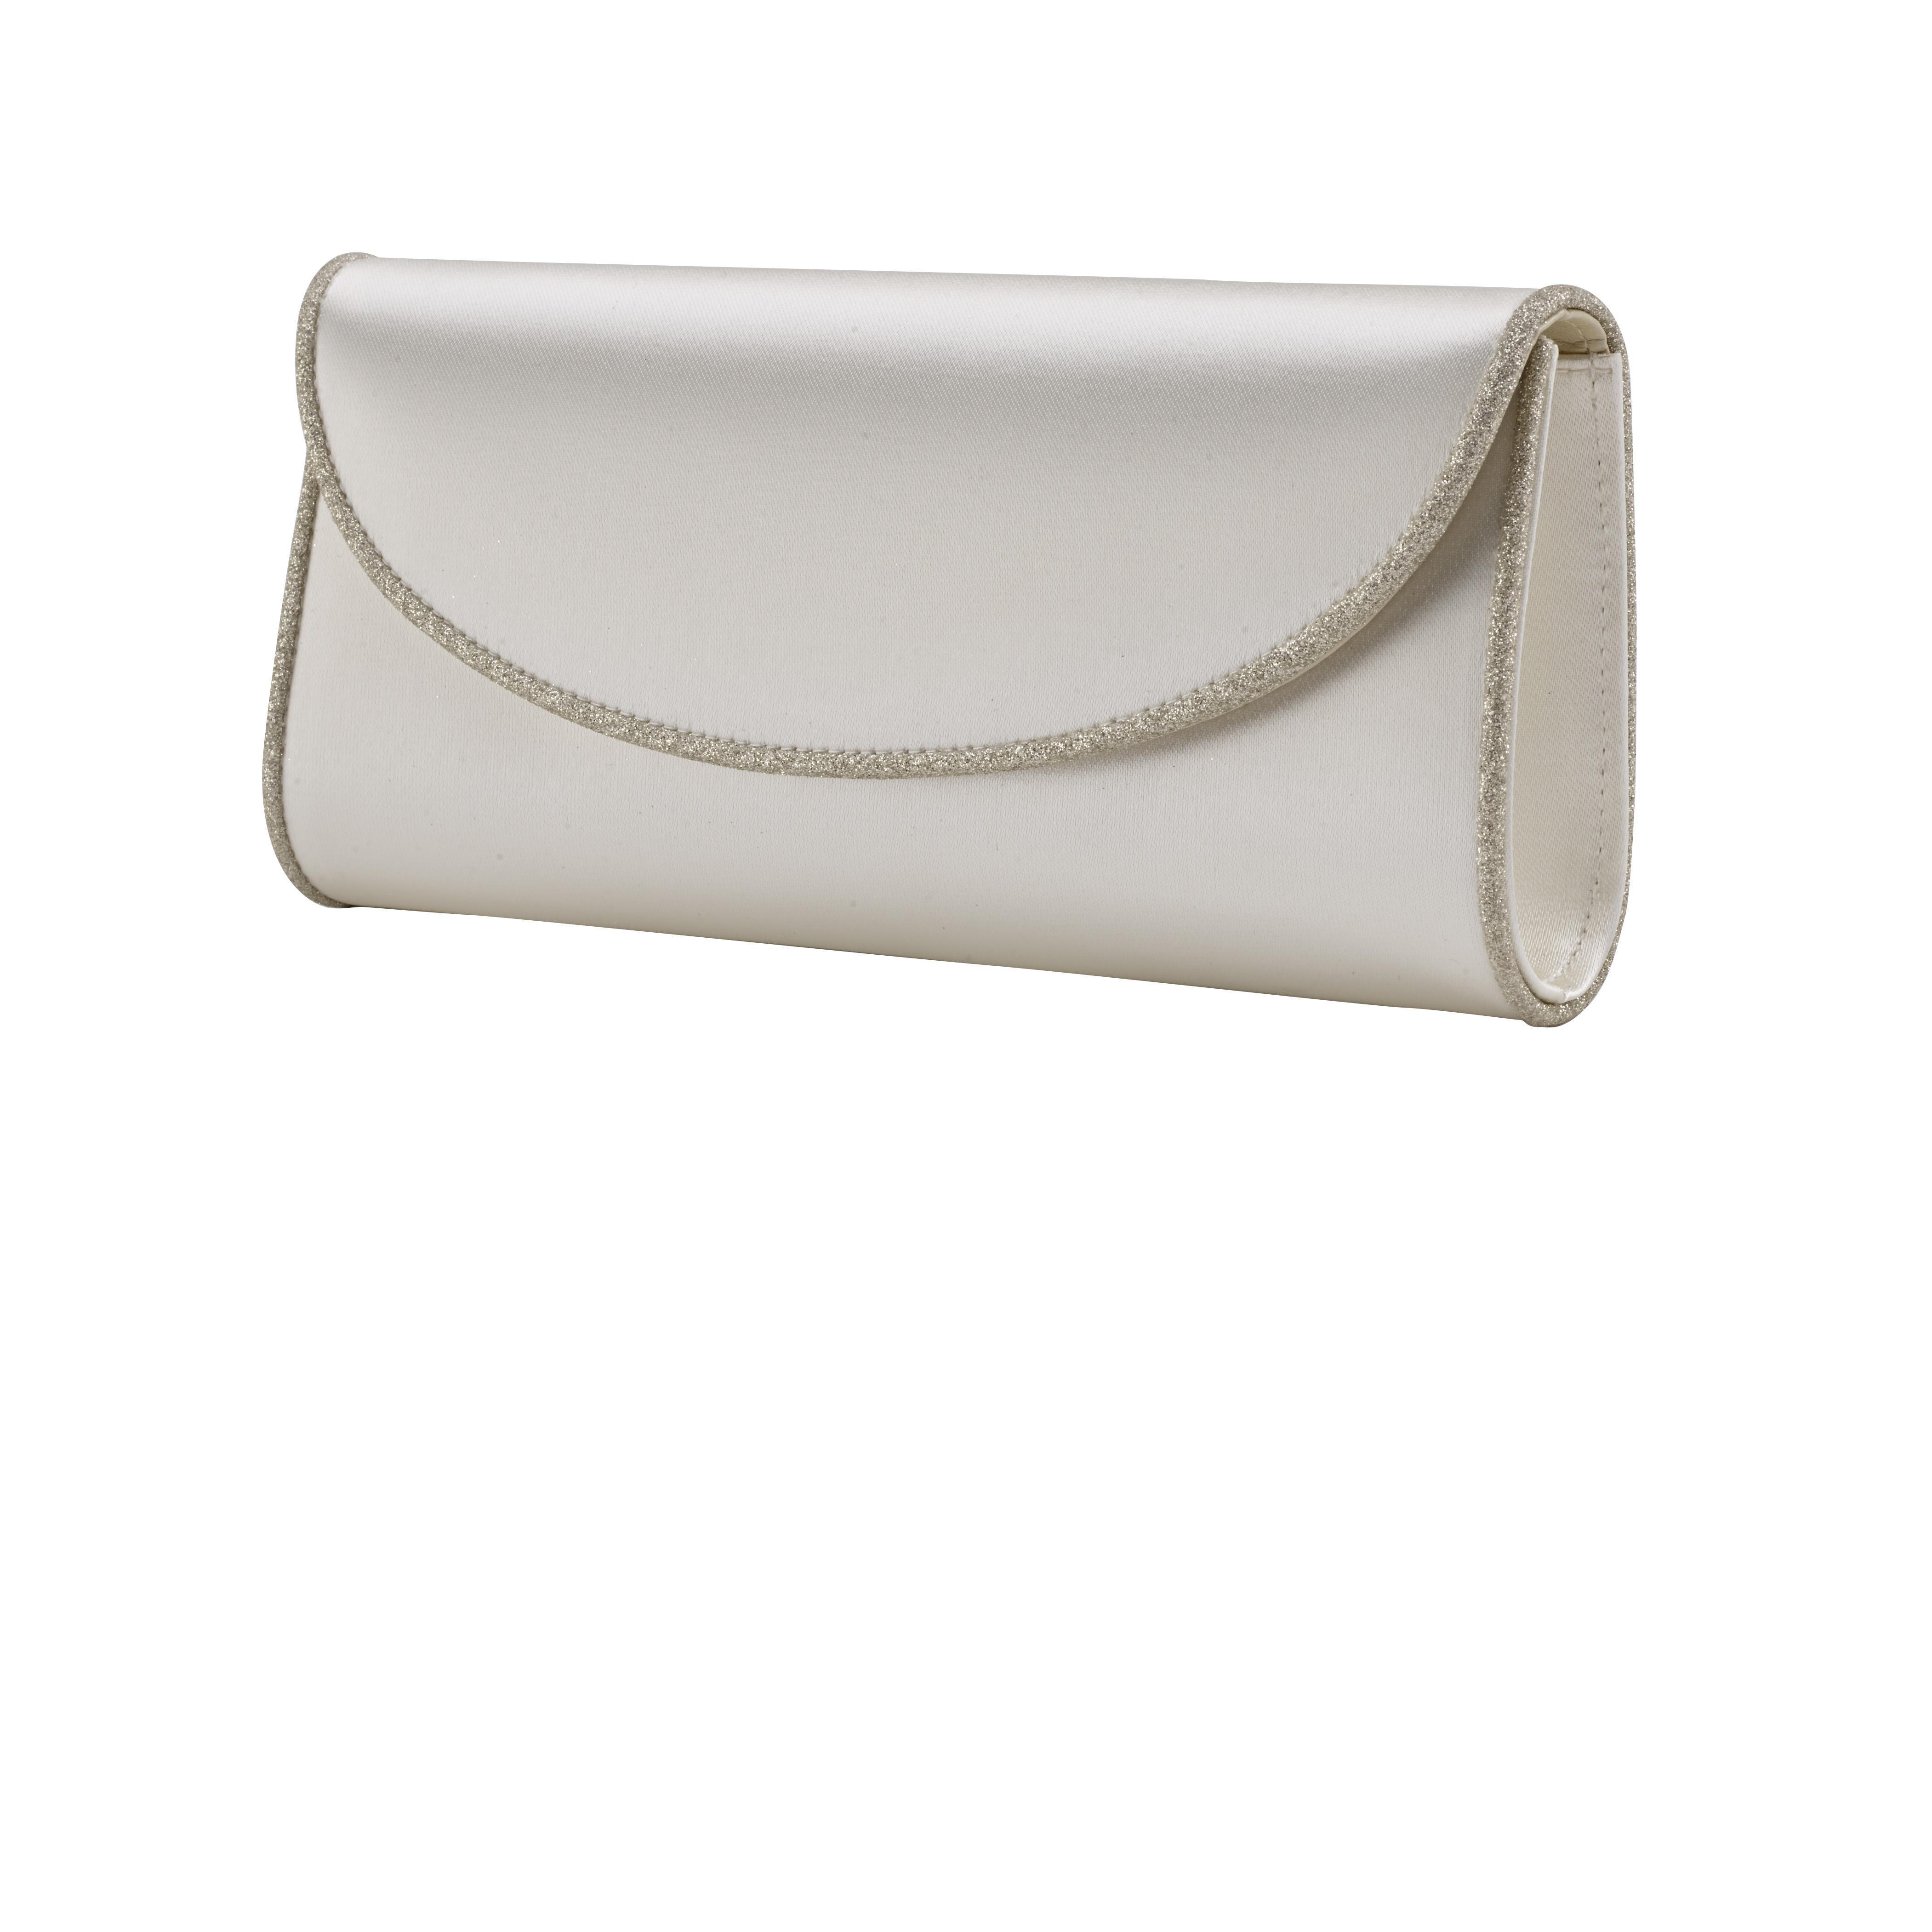 c0263bd3654 Rainbow Club Viki Handbag - Crystal Bridal Accessories